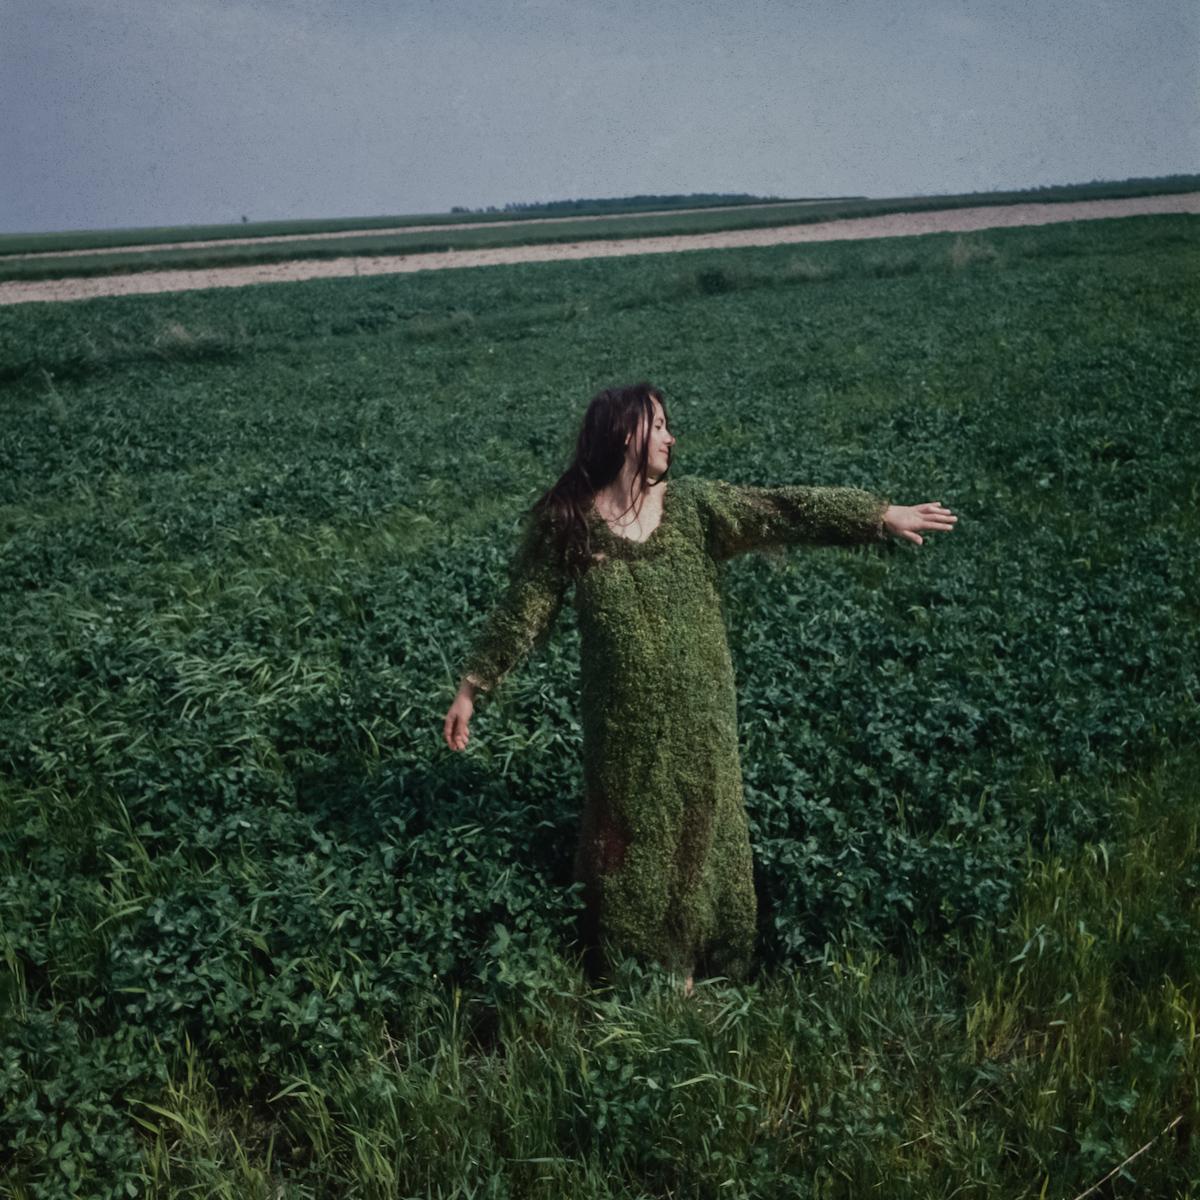 Teresa Murak, Uciszająca burzę, 1985/2016, , fot.Maciej Musiał